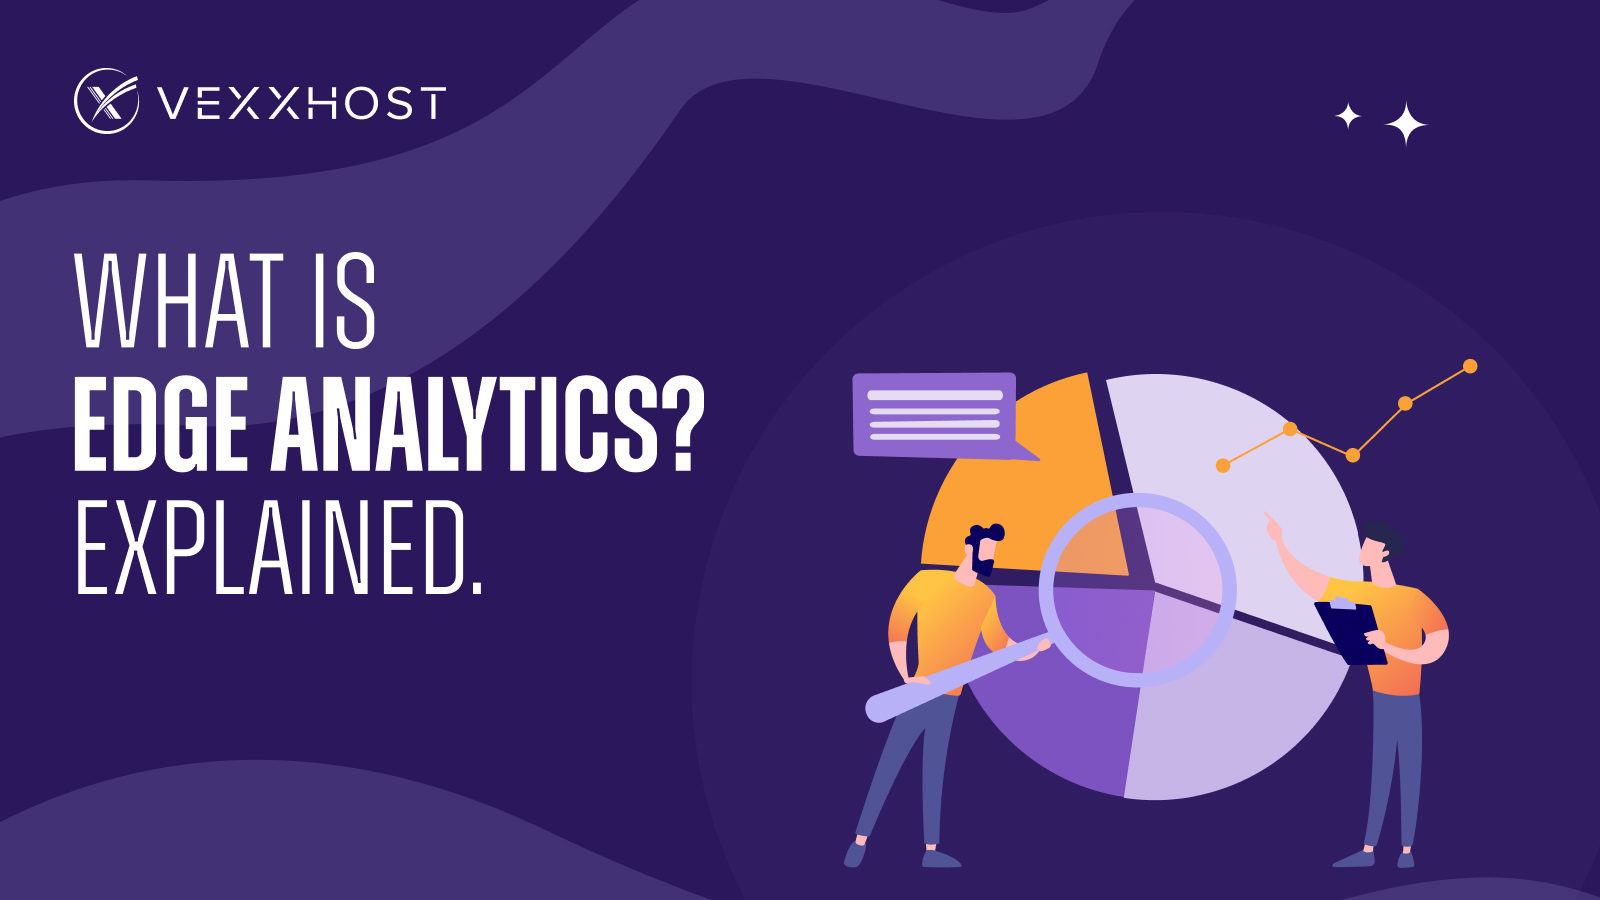 What is Edge Analytics? Explained.